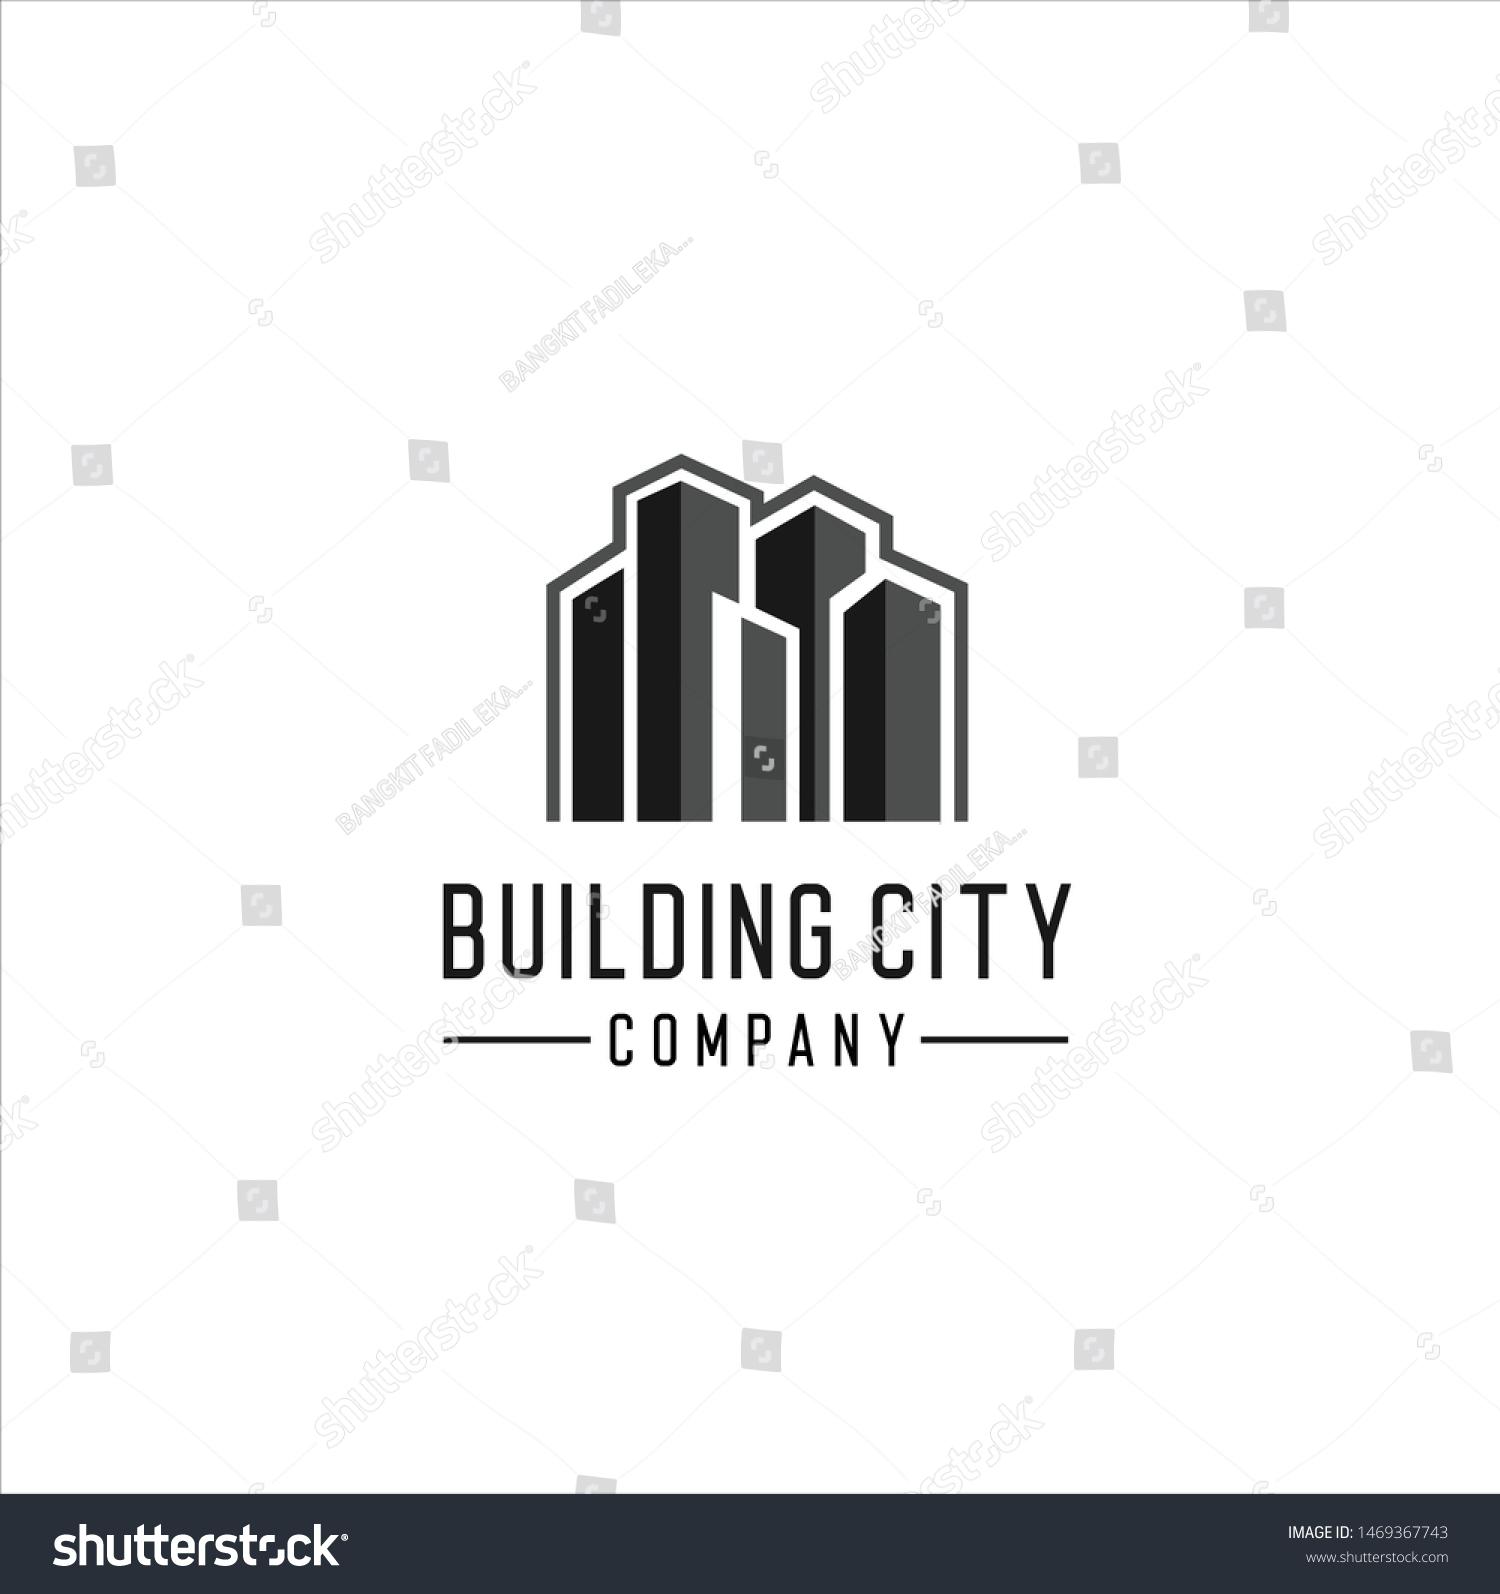 Building City Logo Design Inspiration Vector Stock Vector Royalty Free 1469367743